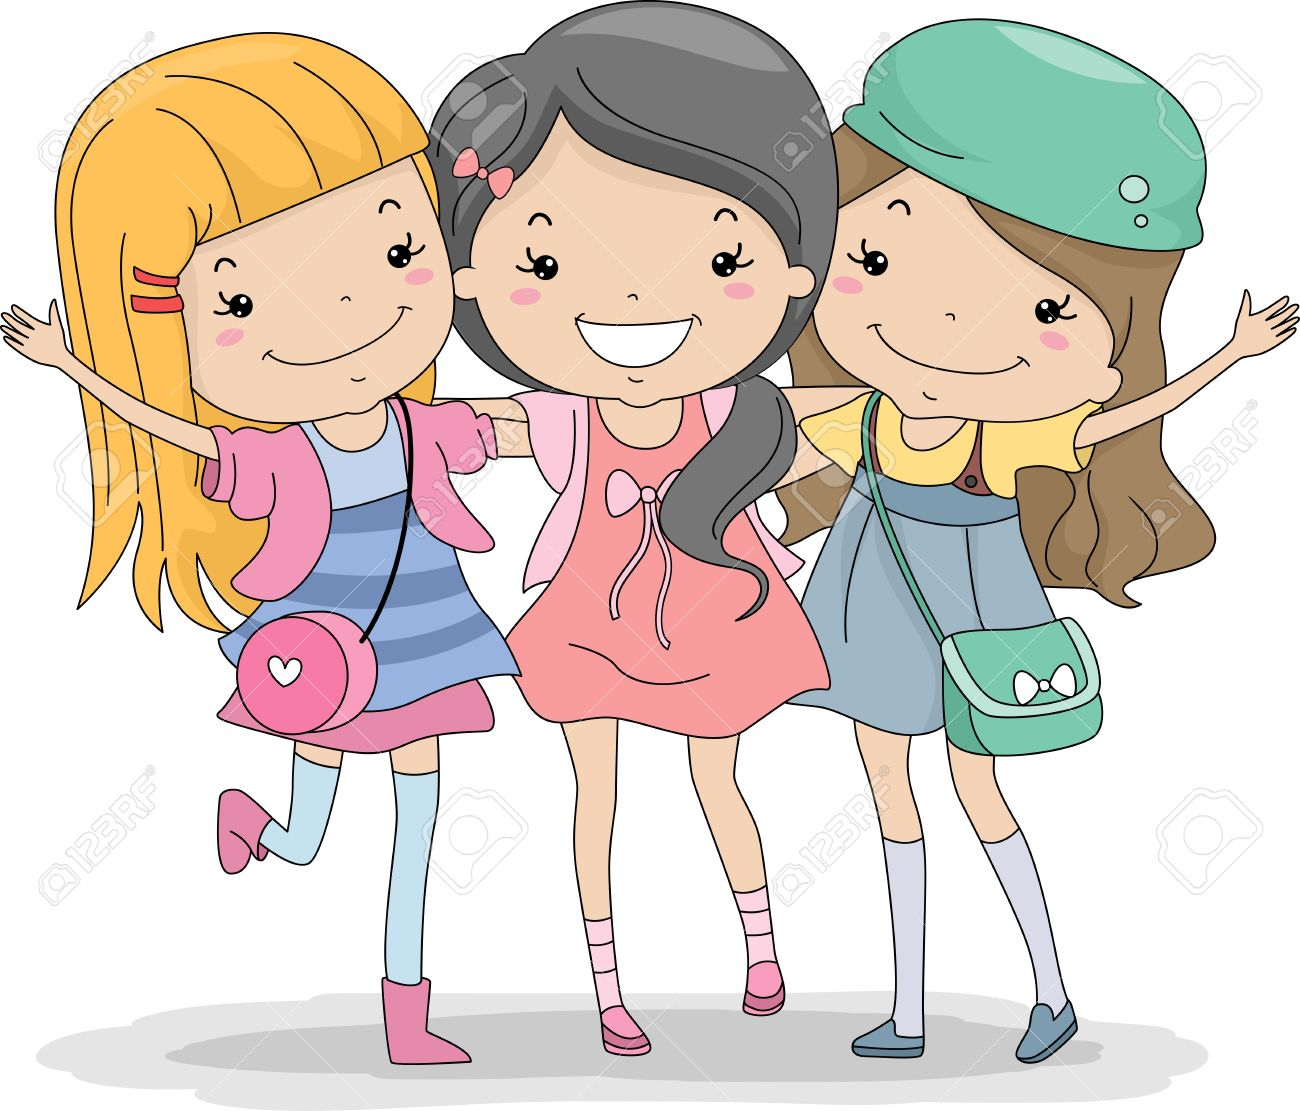 free cartoon friendship images